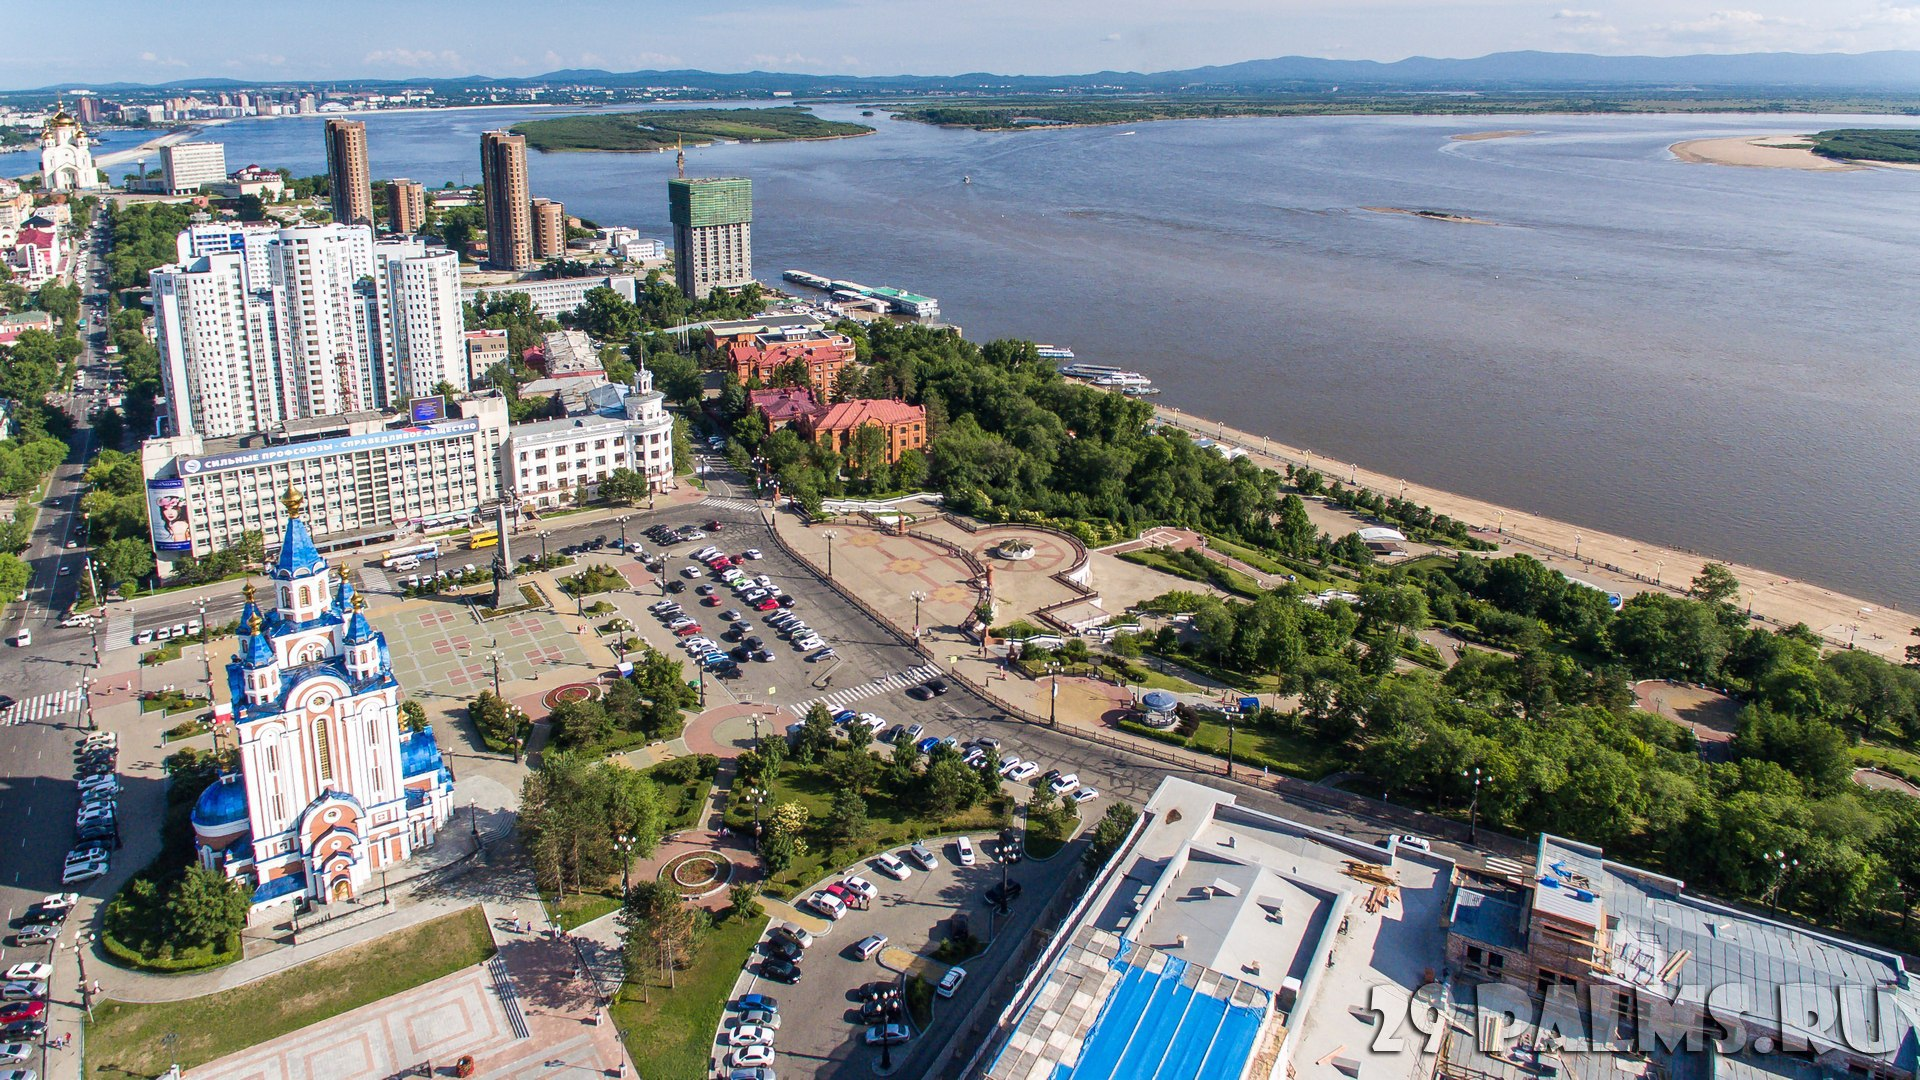 001_Rossiya_Habarovsk_Panorama_Komsomol'skoy_ploschadi_Khabarovsk_Komsomolskaya_square_Russian_far_East_Foto_AlexS_-_Depositphotos